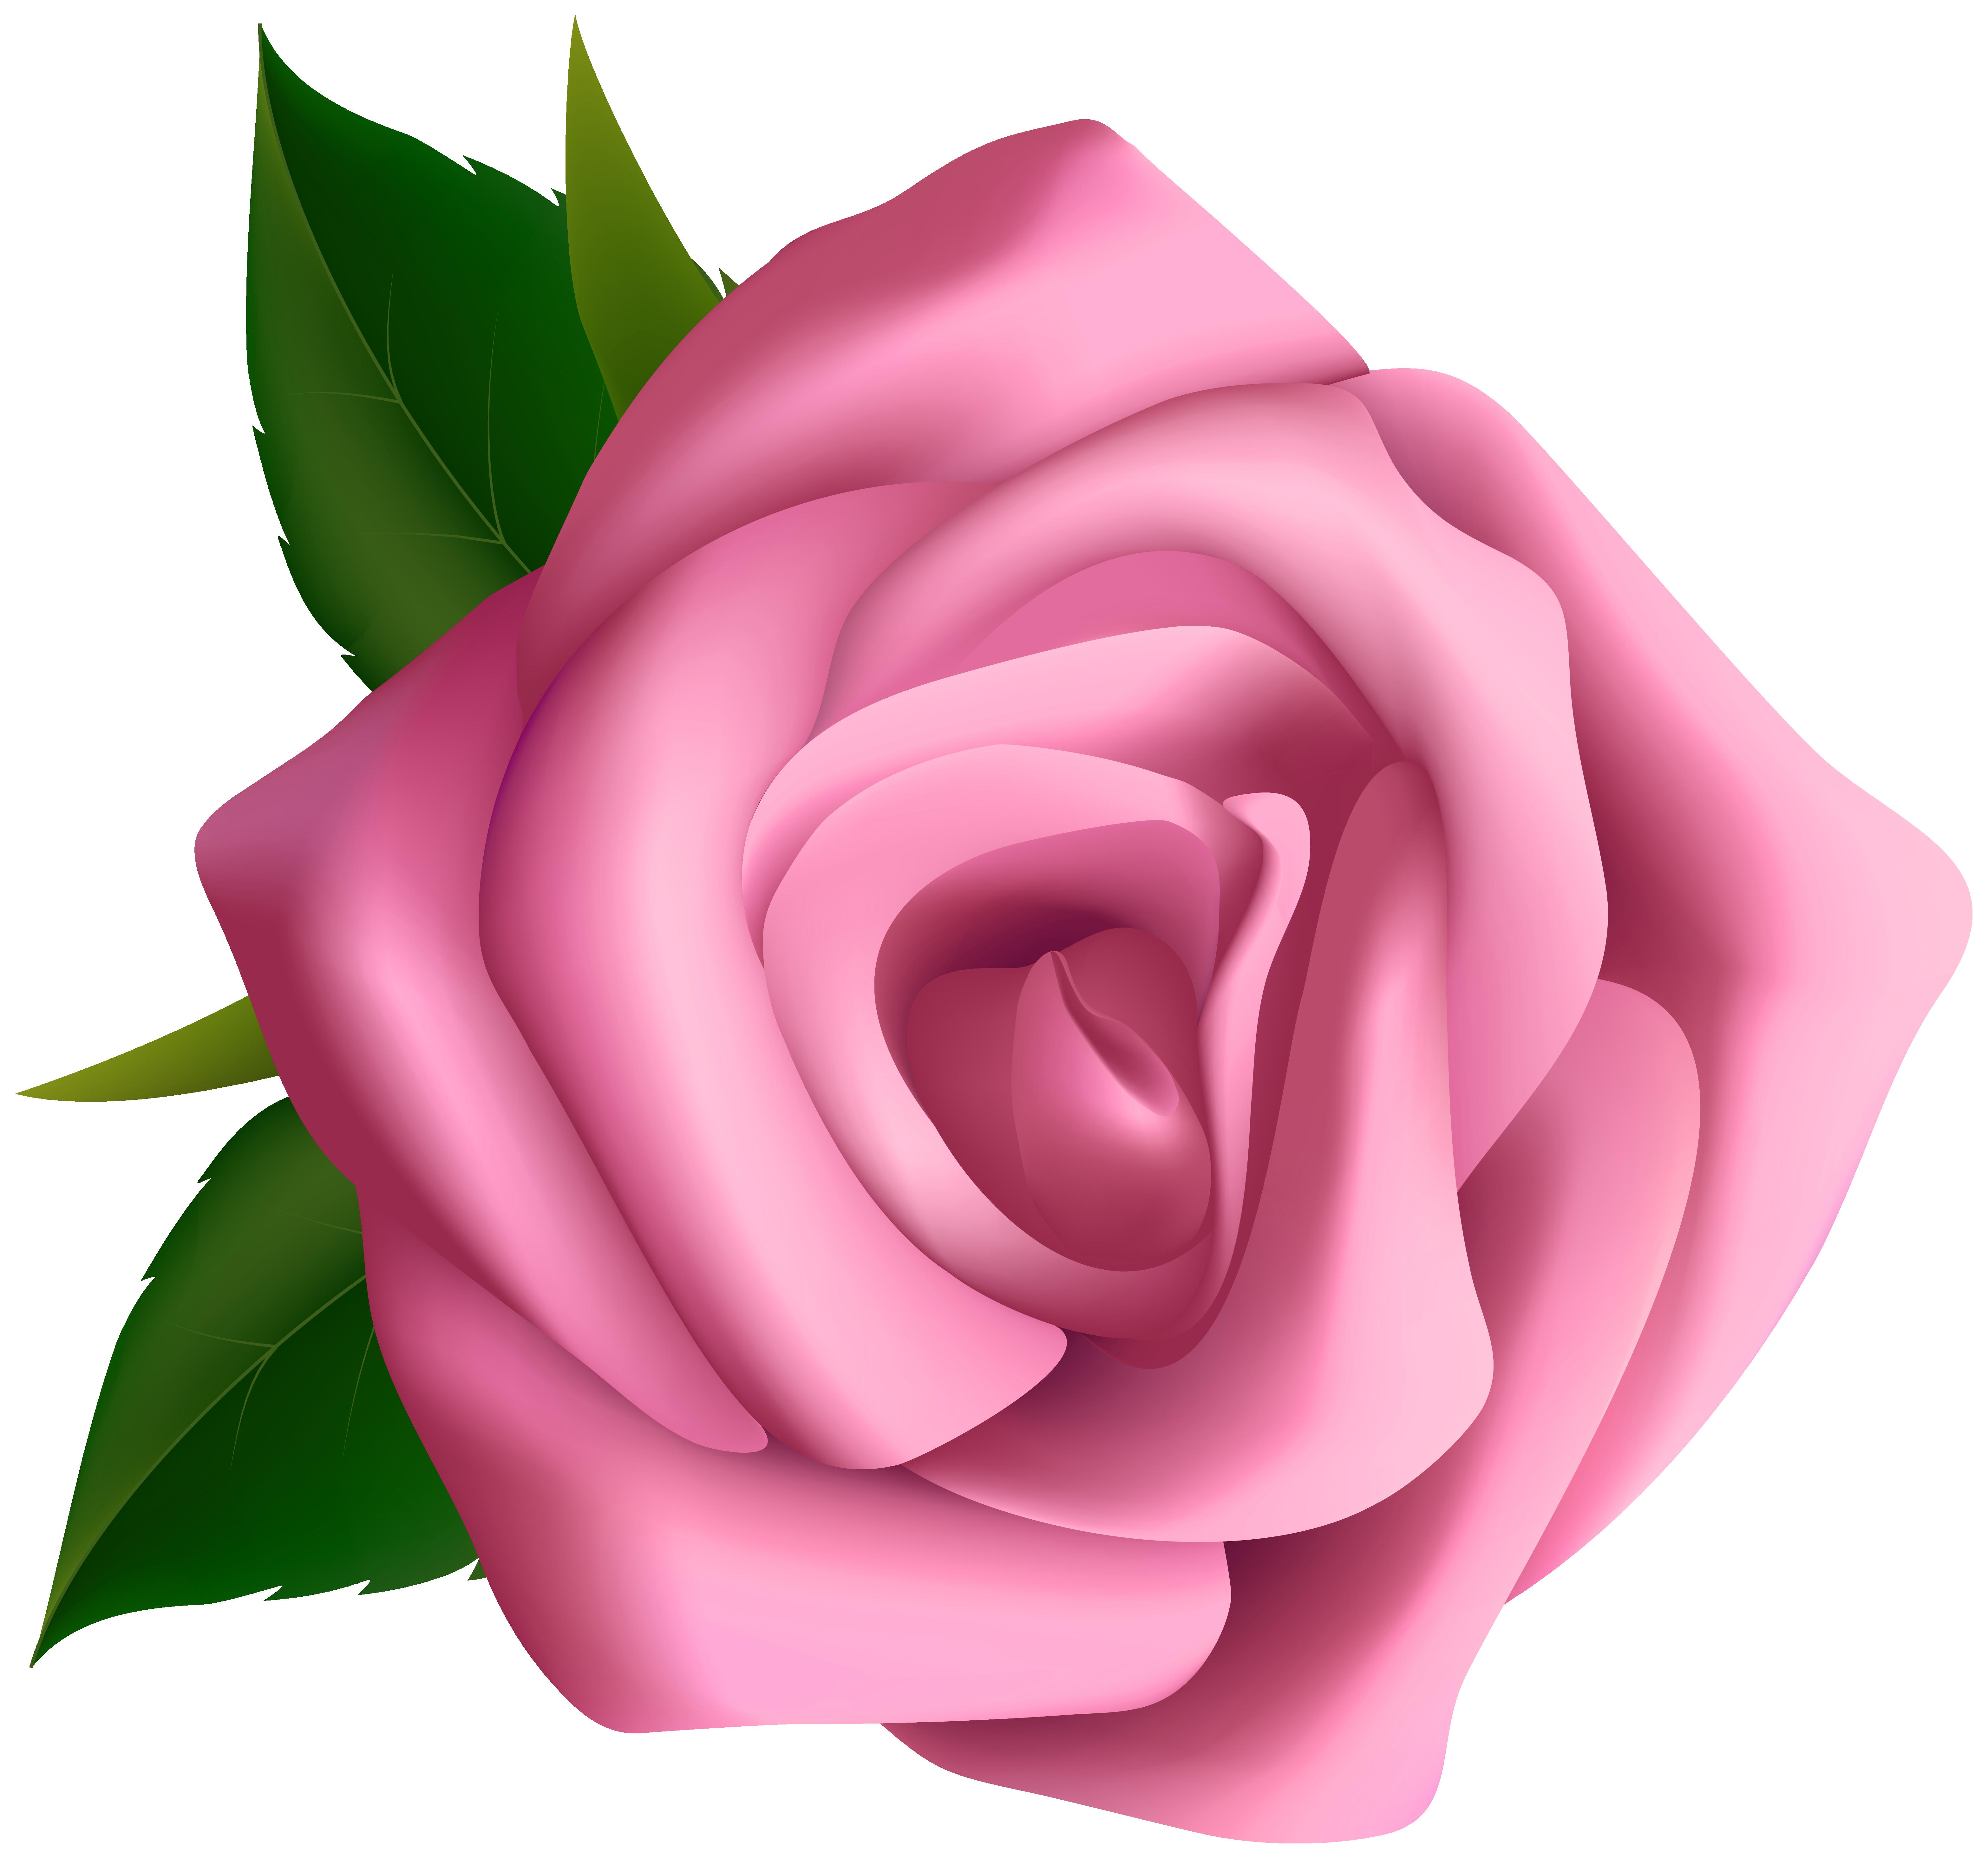 Rose clipart pink rose #9